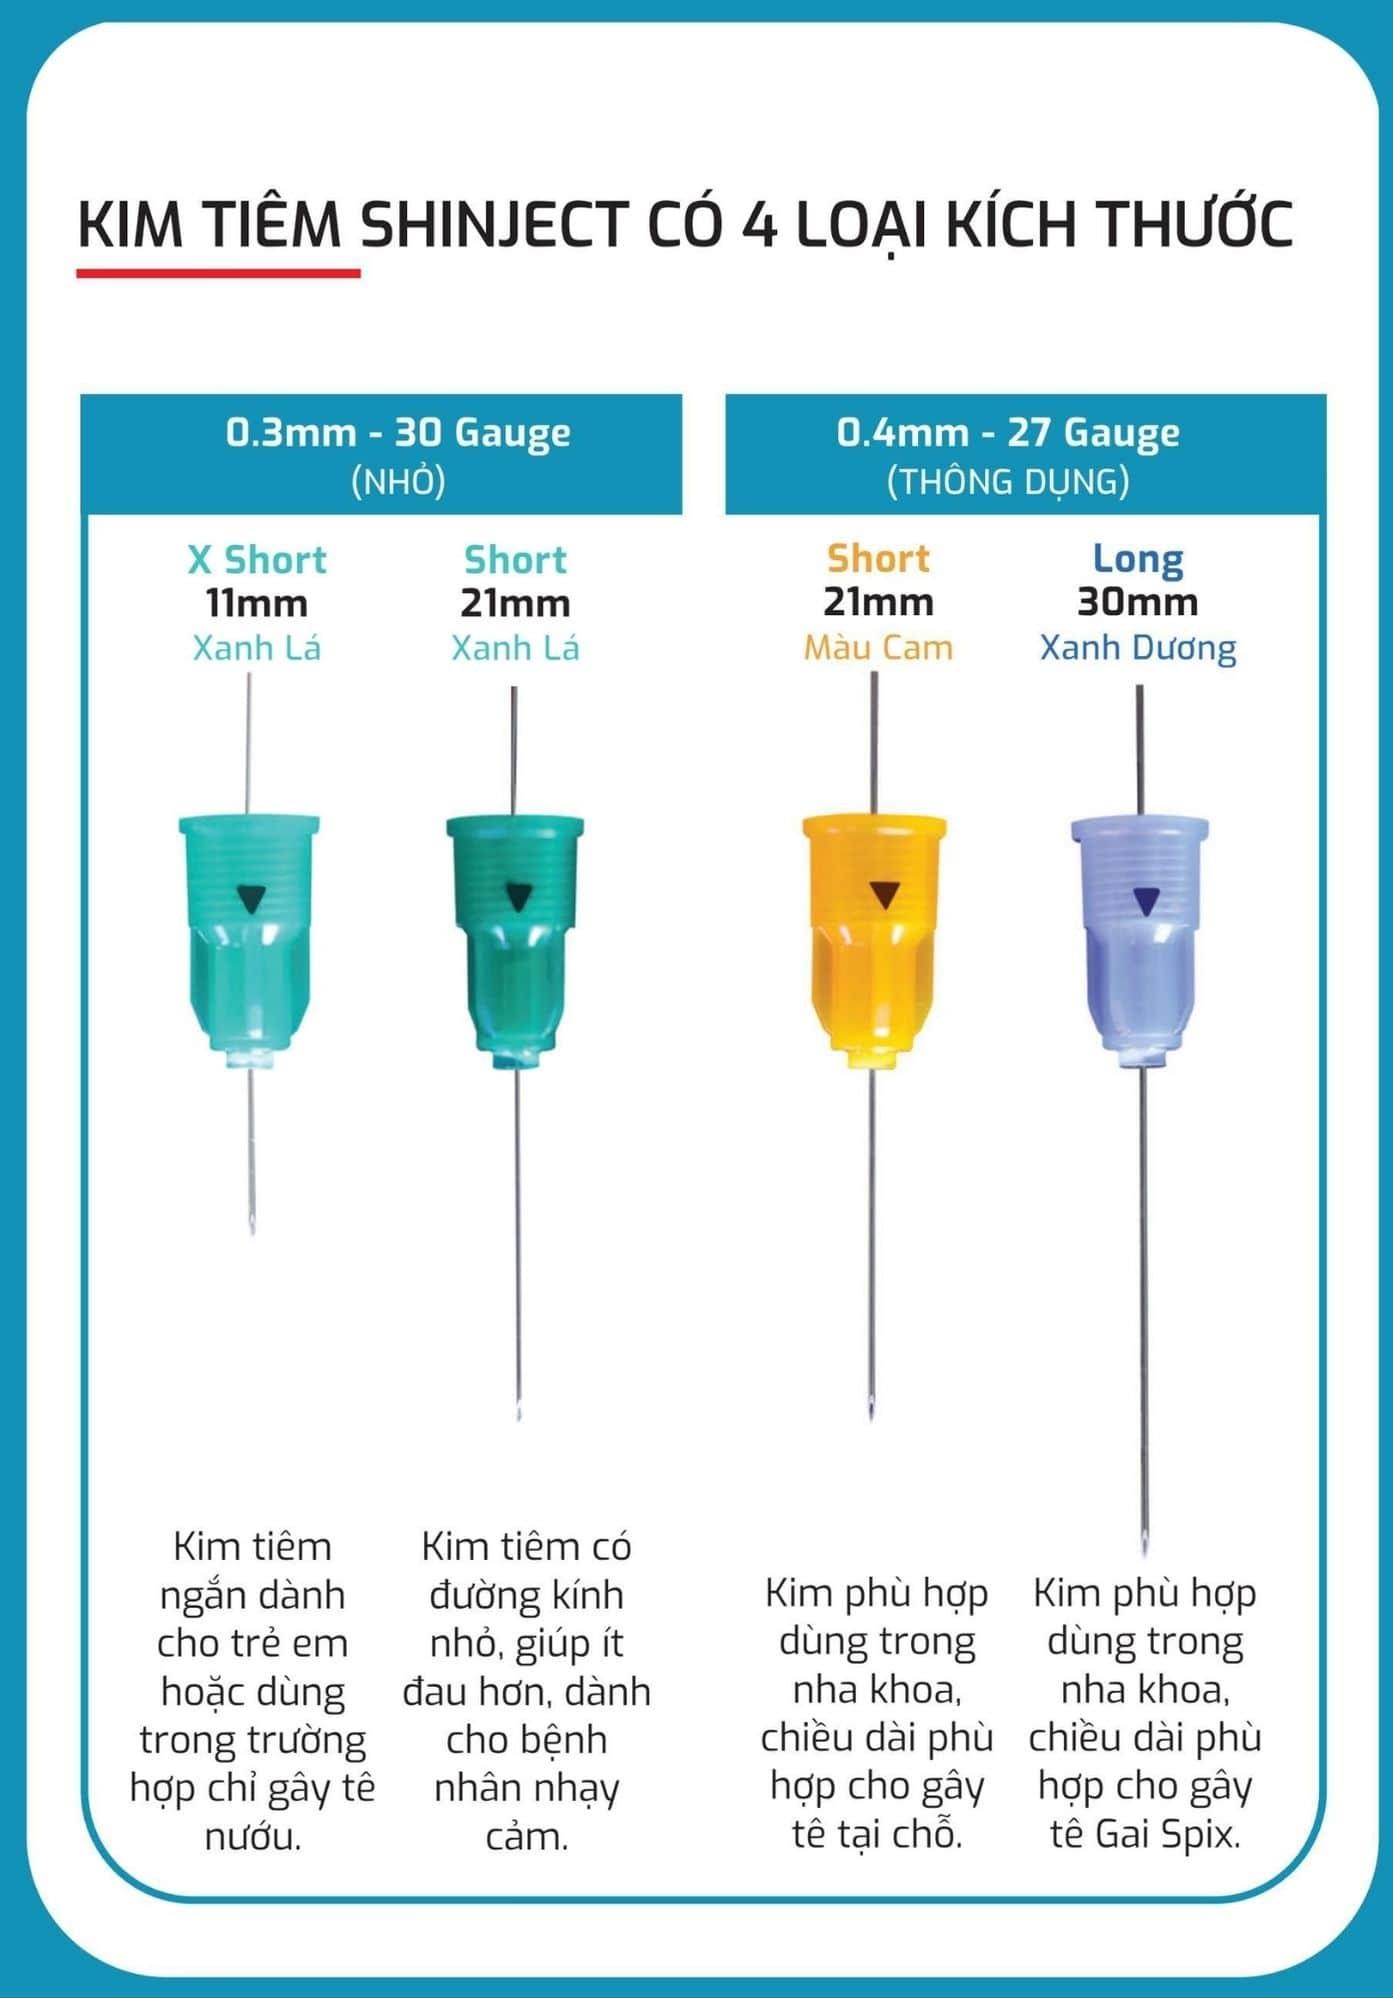 kim-tiem-gay-te-nha-khoa-Shinject-shinhung-10